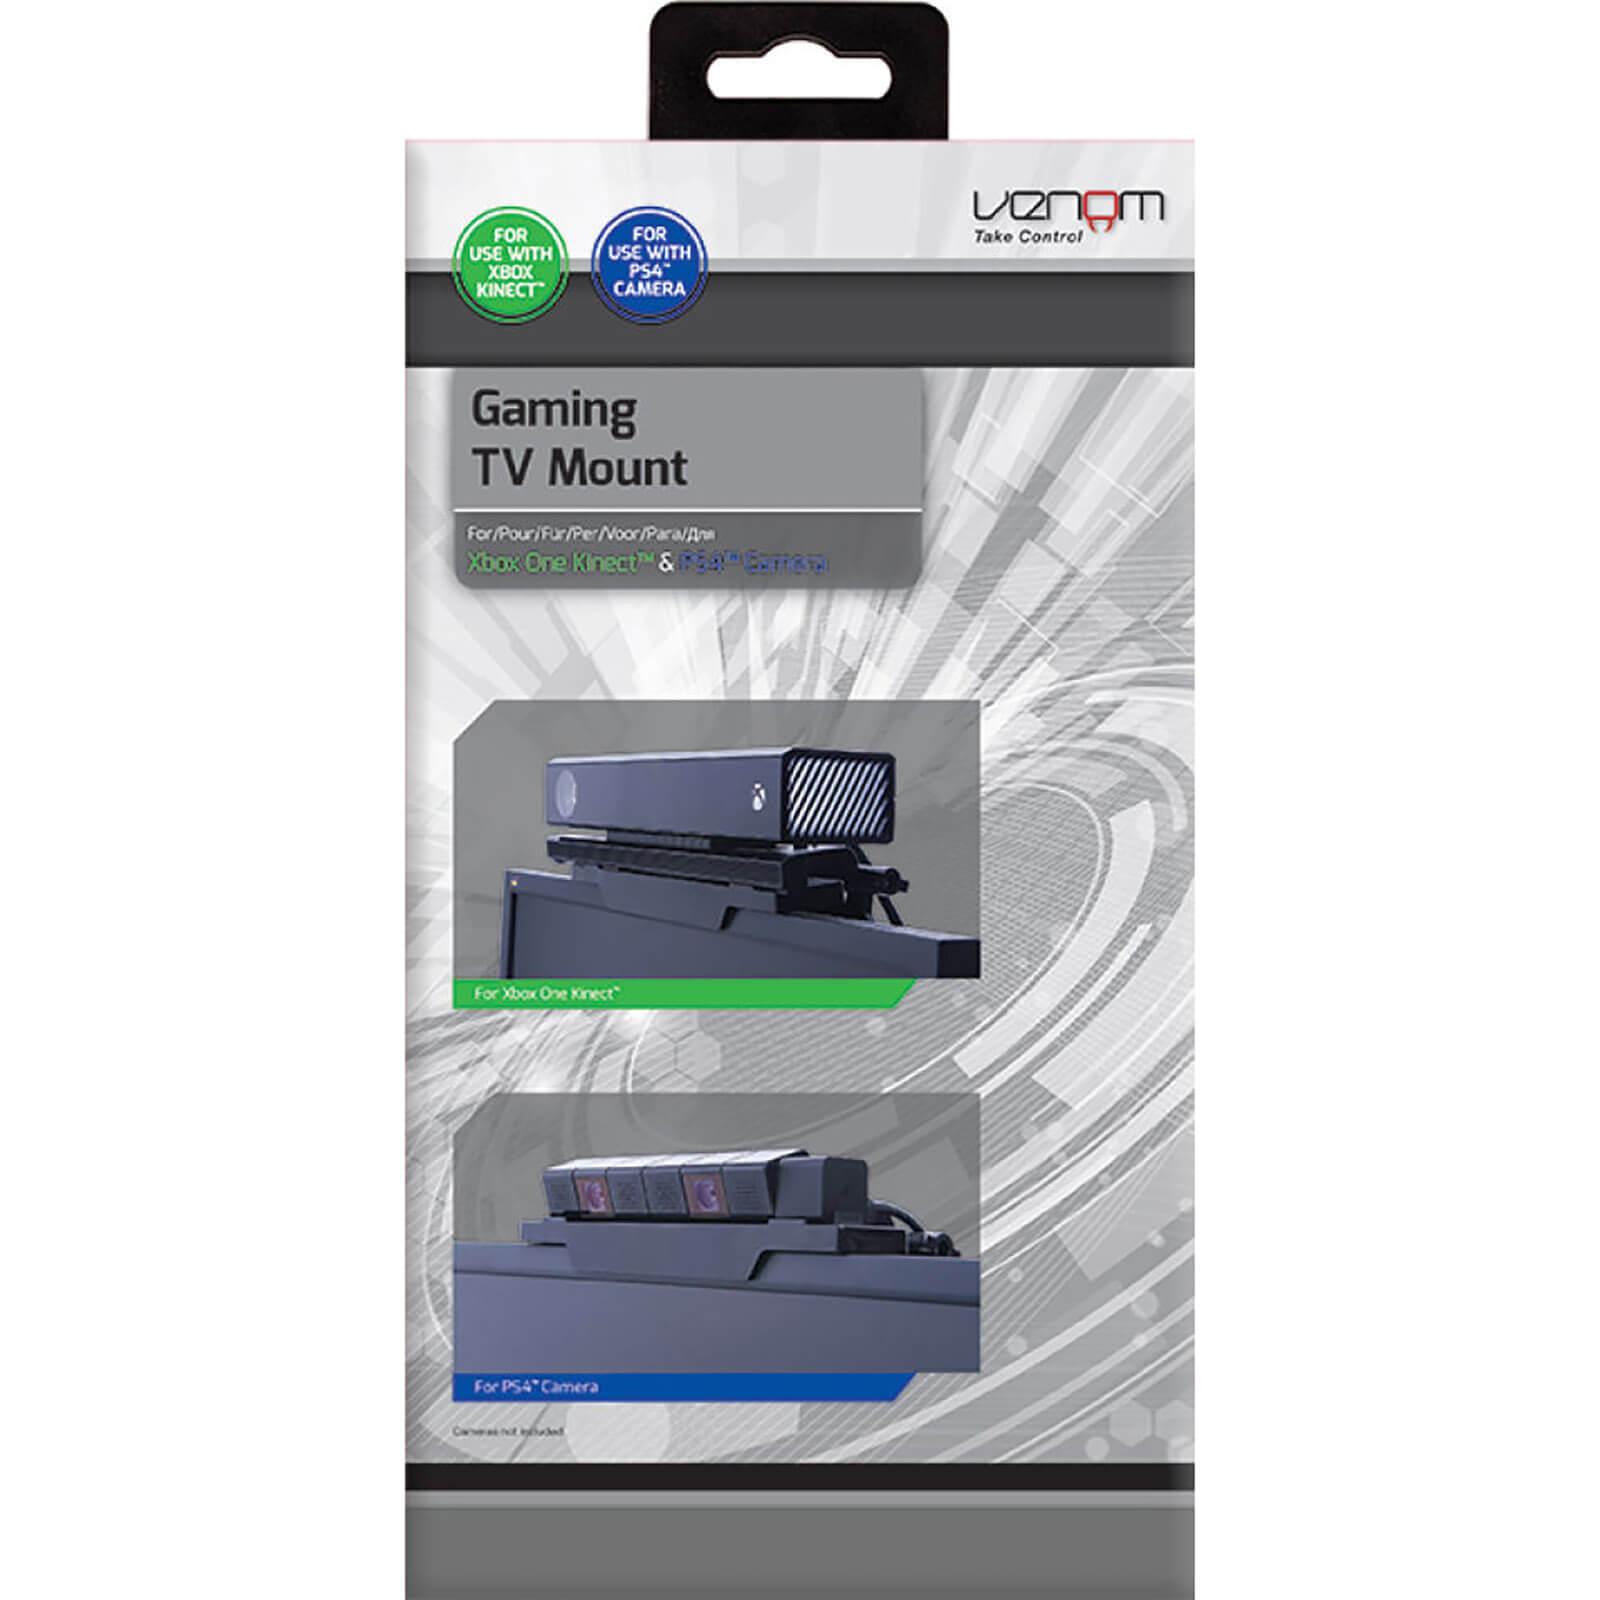 Venom Gaming TV Mount for Xbox Kinect & PS4 Camera